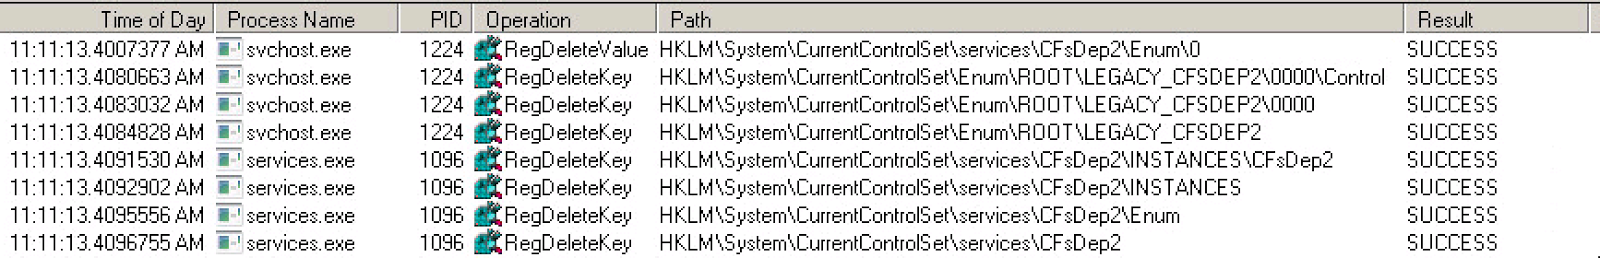 Silent Install of Citrix PVS Target Device software – Trentent Tye